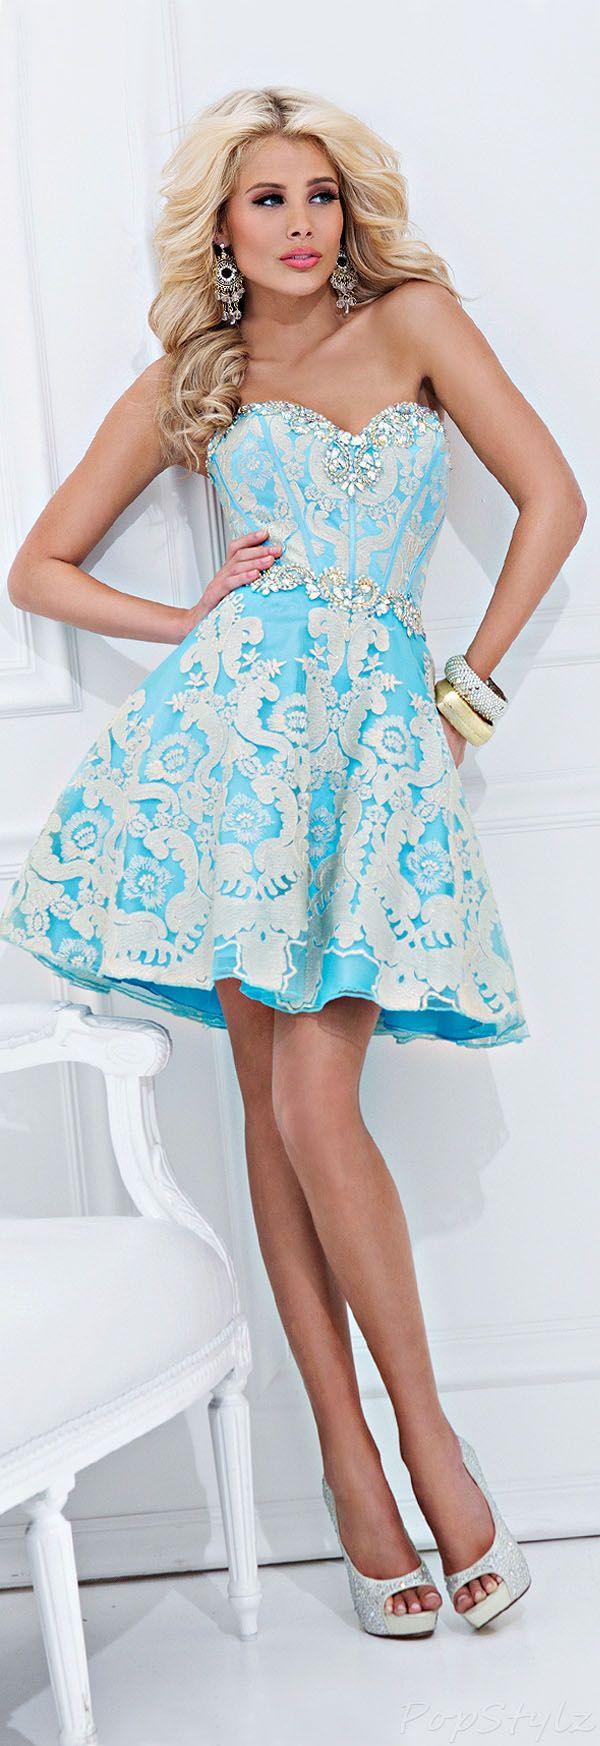 20 best vestidos lendos images on Pinterest | Weddings, Bridesmaids ...